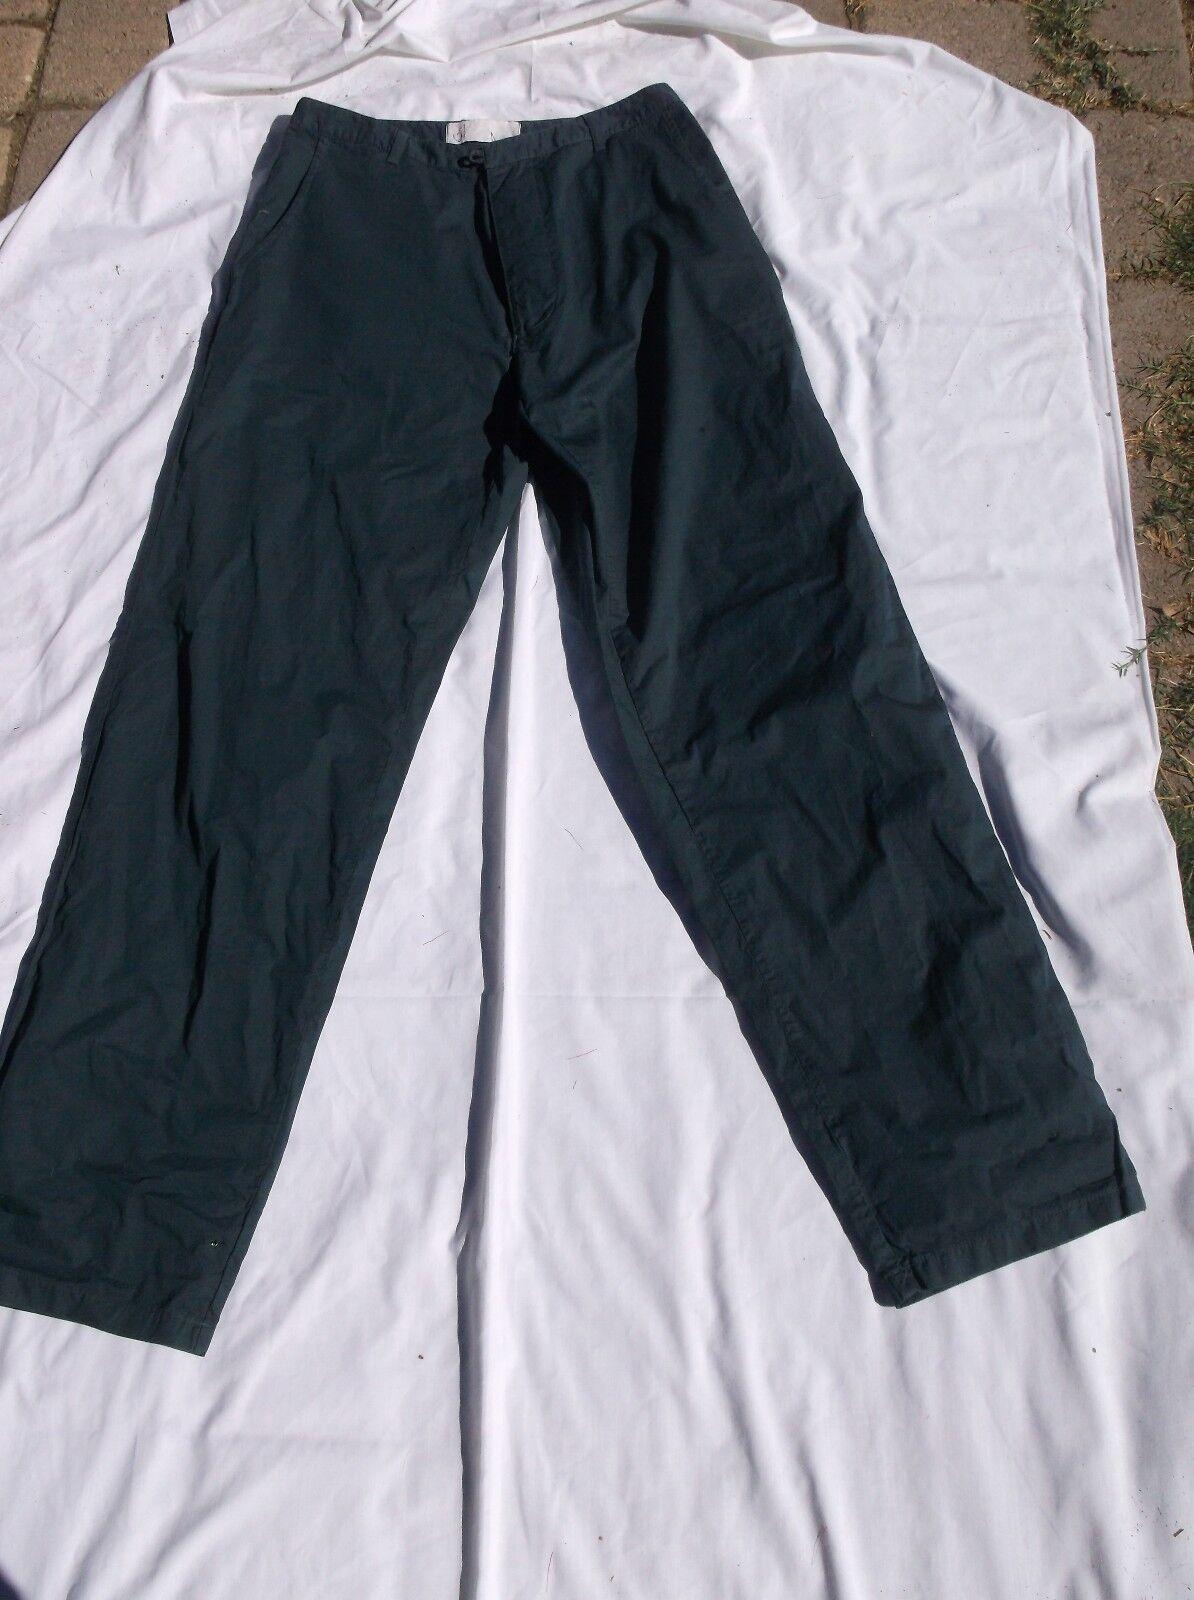 Romeo Gigli bluee cotton pants  NWT  32 x 35 summer-weight high waist